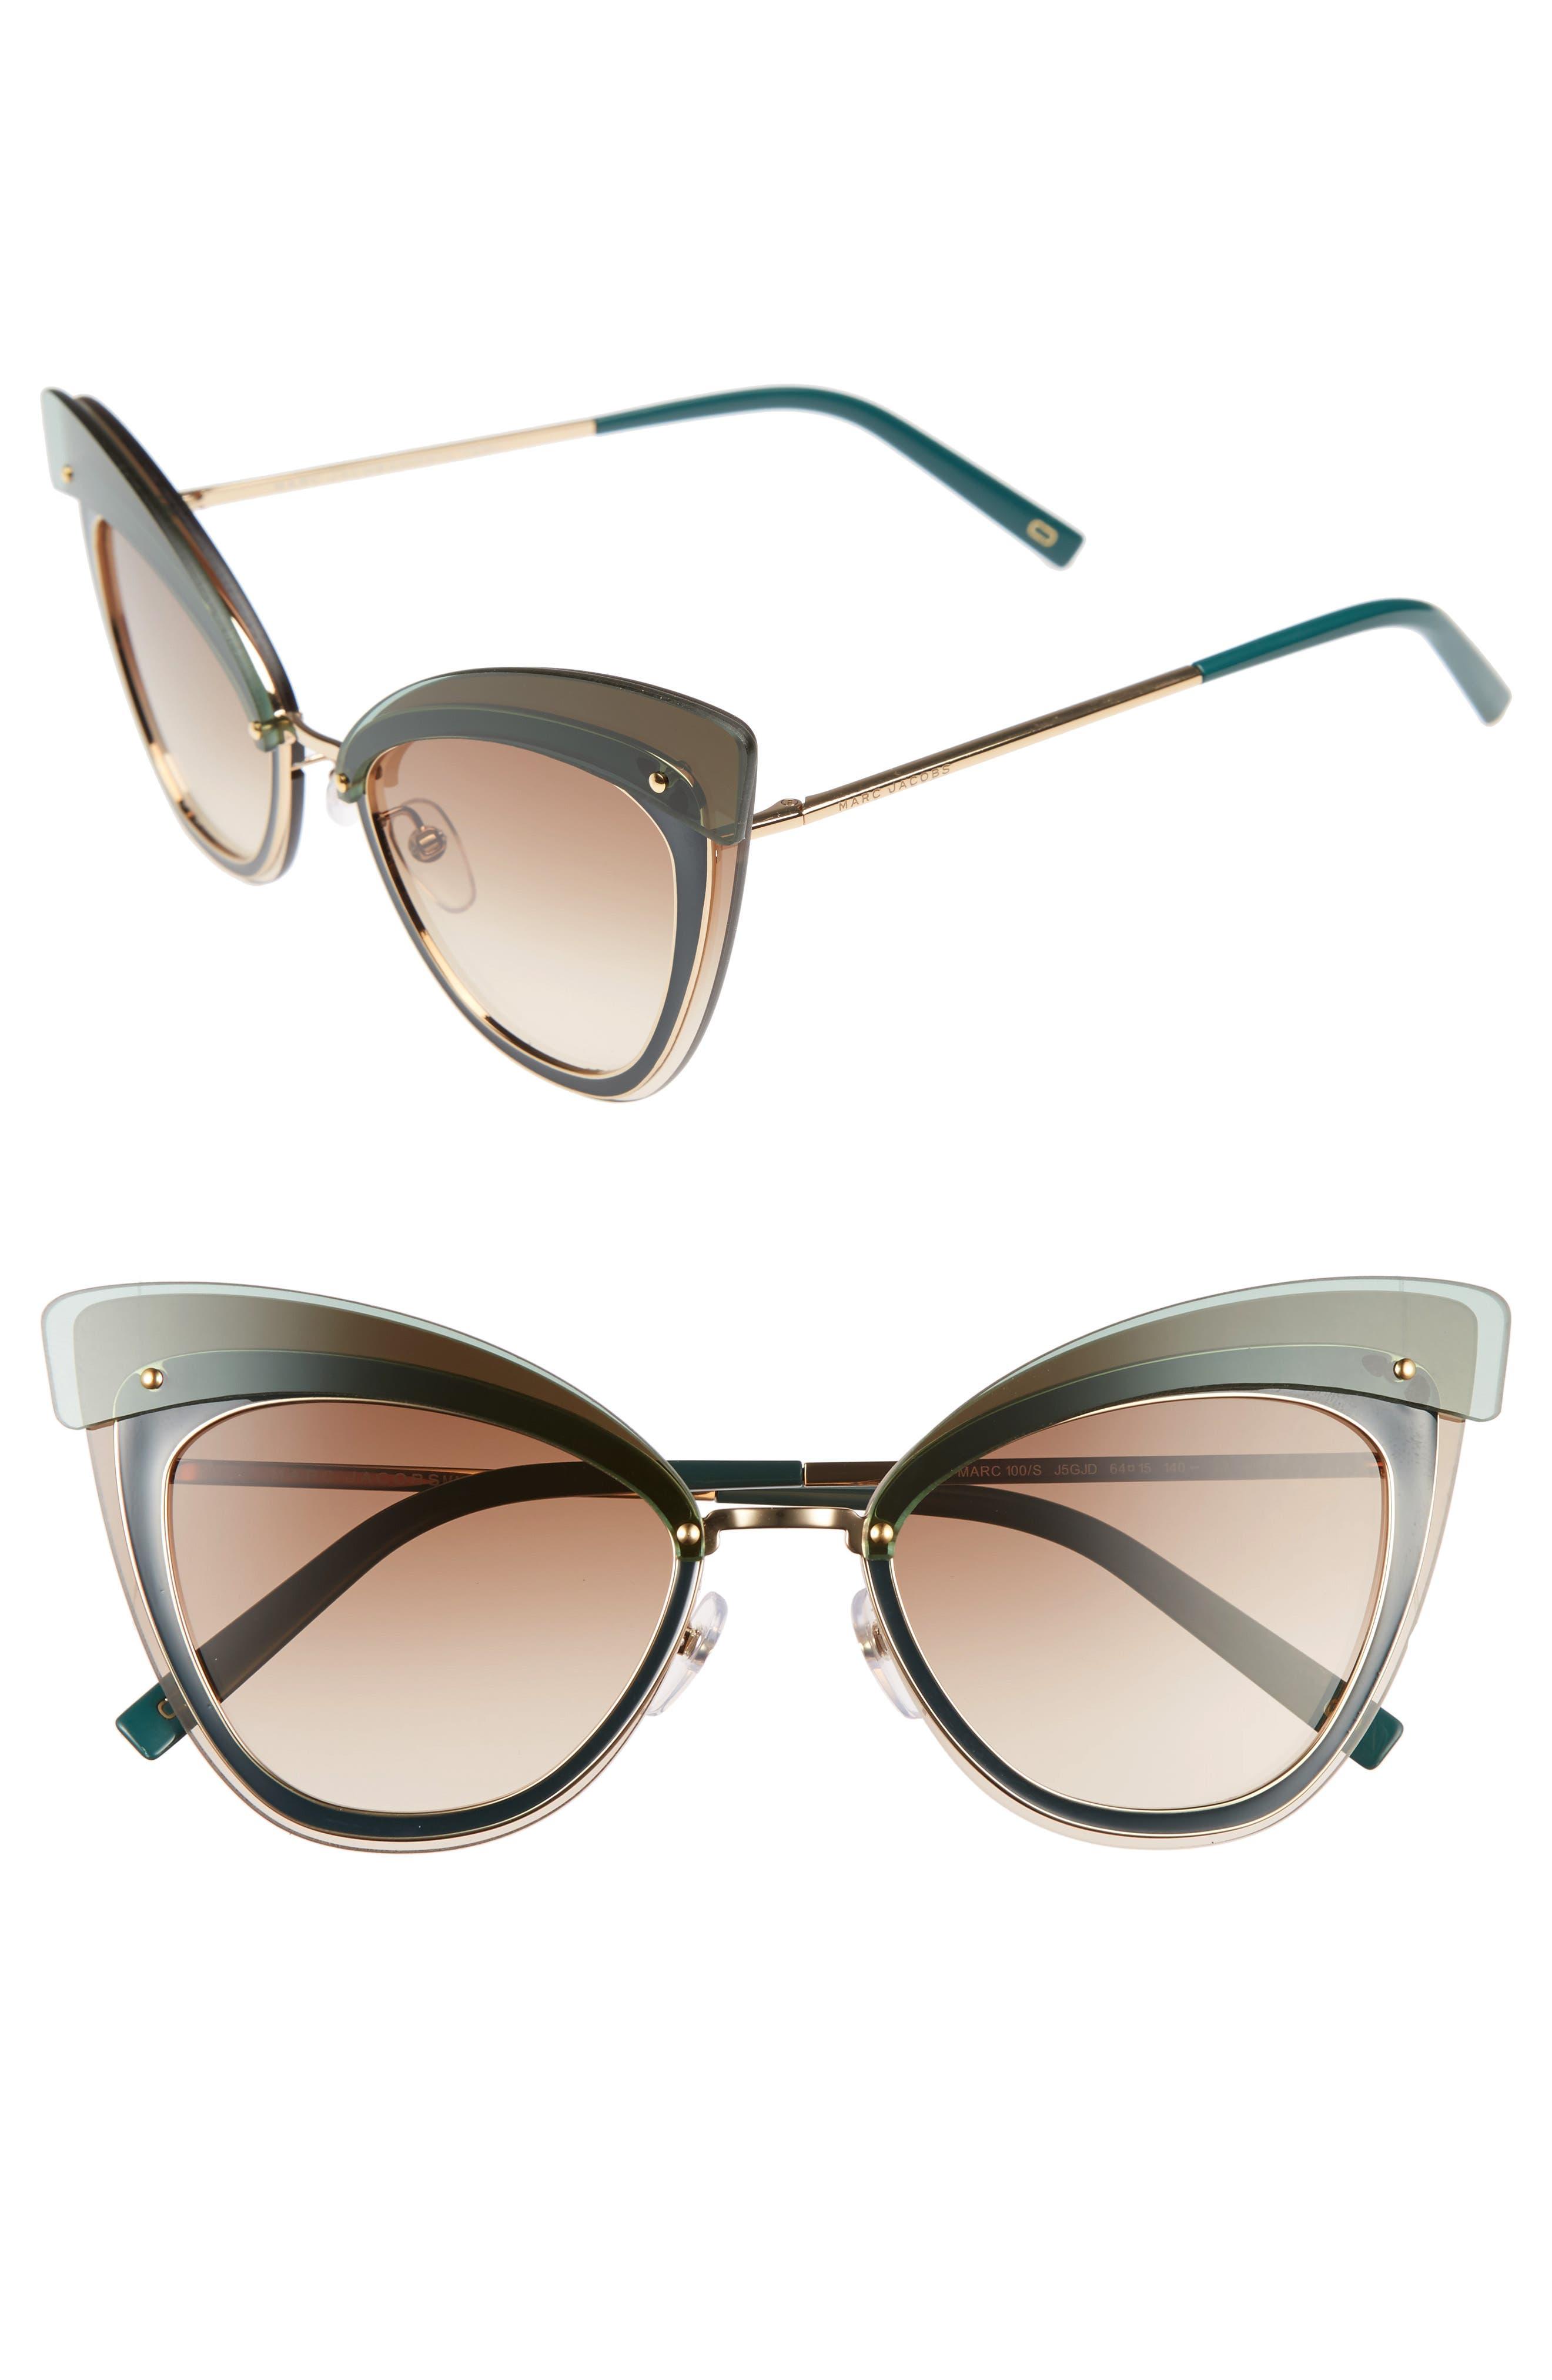 64mm Sunglasses,                             Alternate thumbnail 6, color,